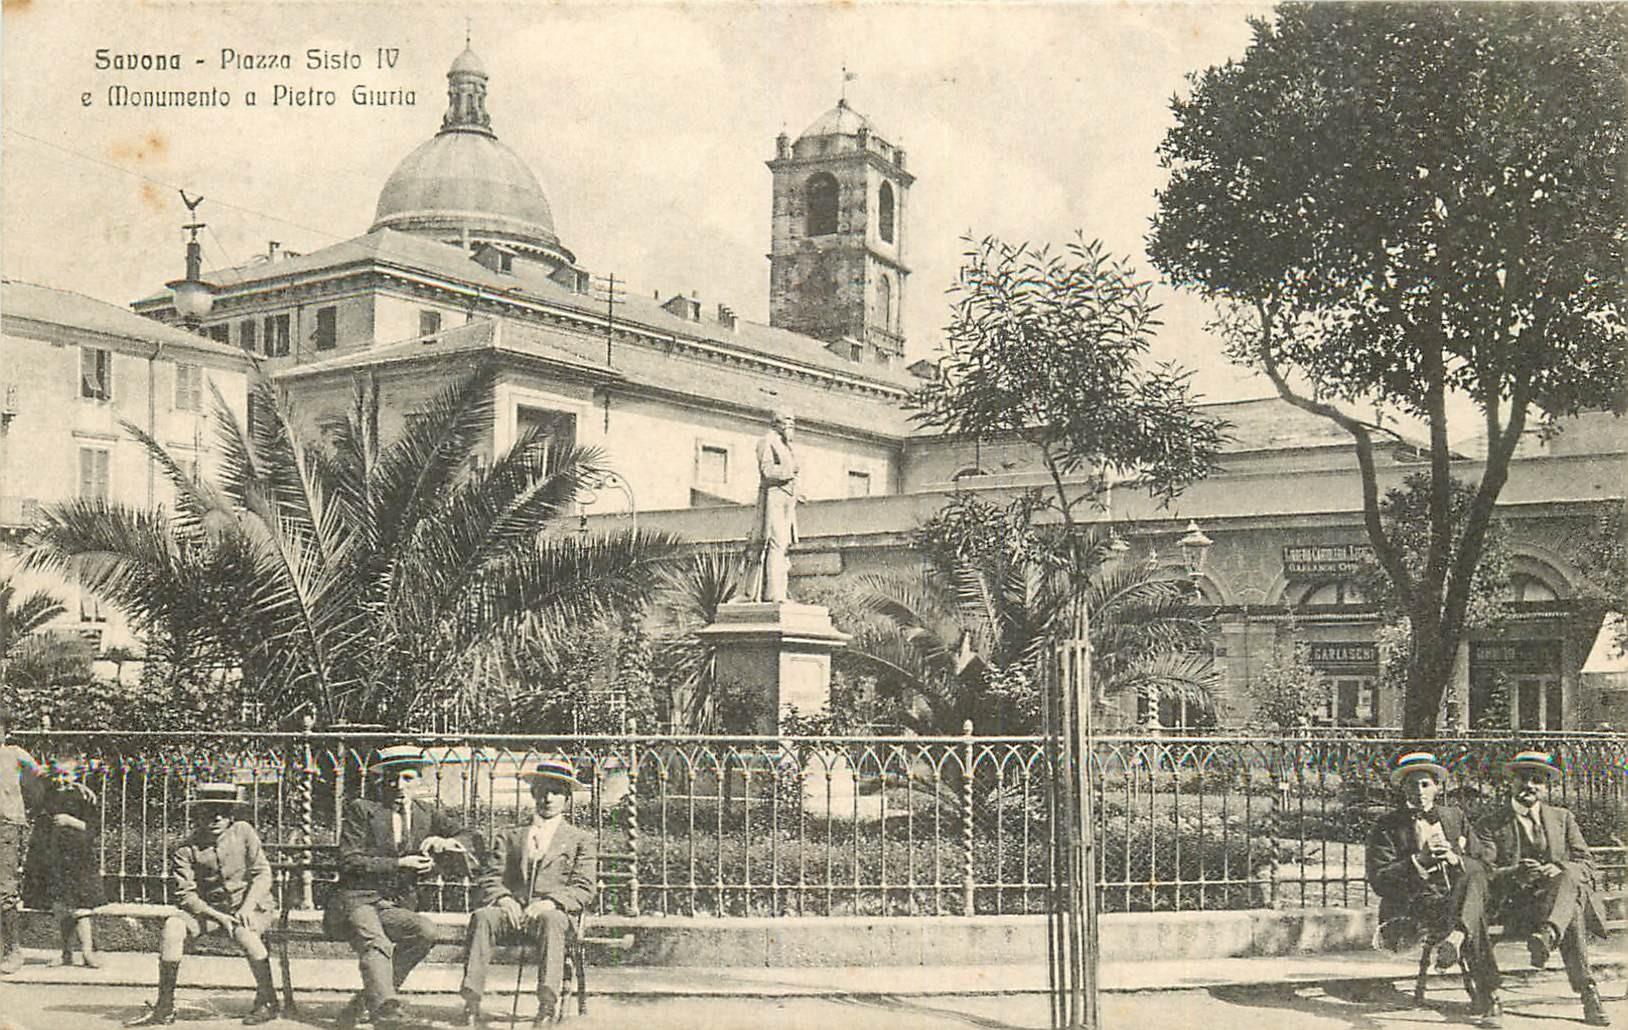 WW SAVONA. Monumento Giuria Piazza Sisto IV in Italia Italie